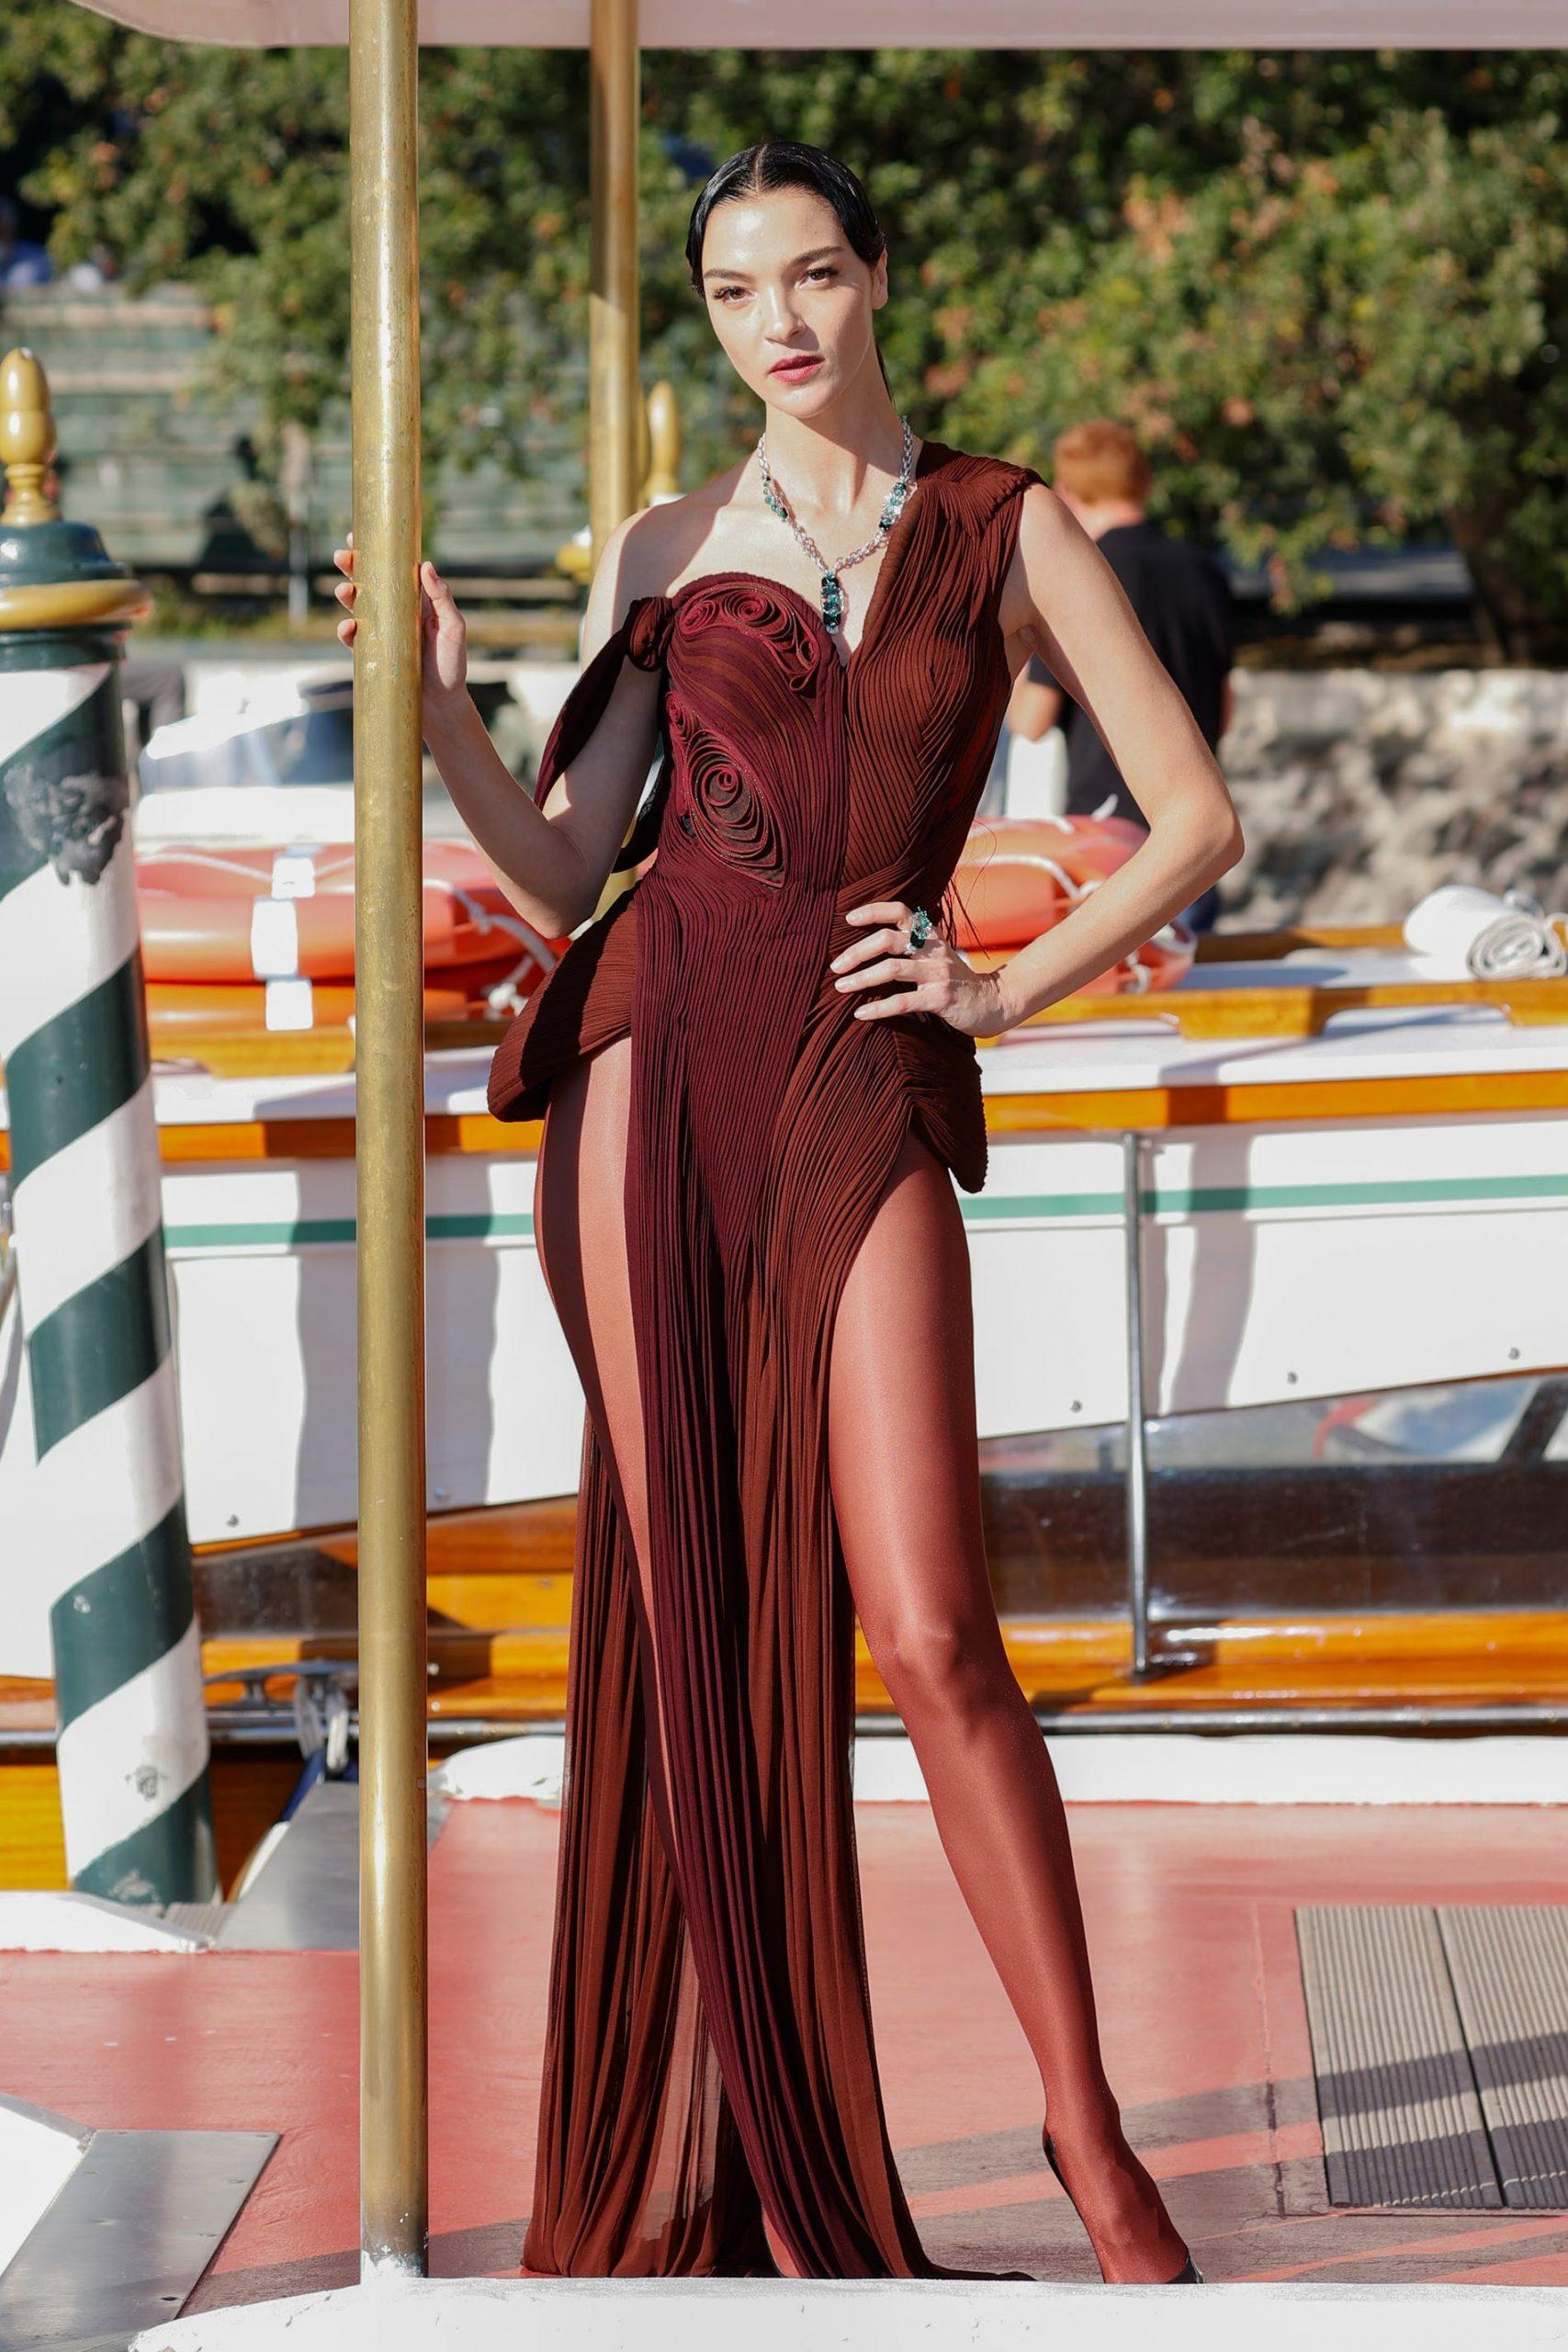 Model Mariacarla Boscono